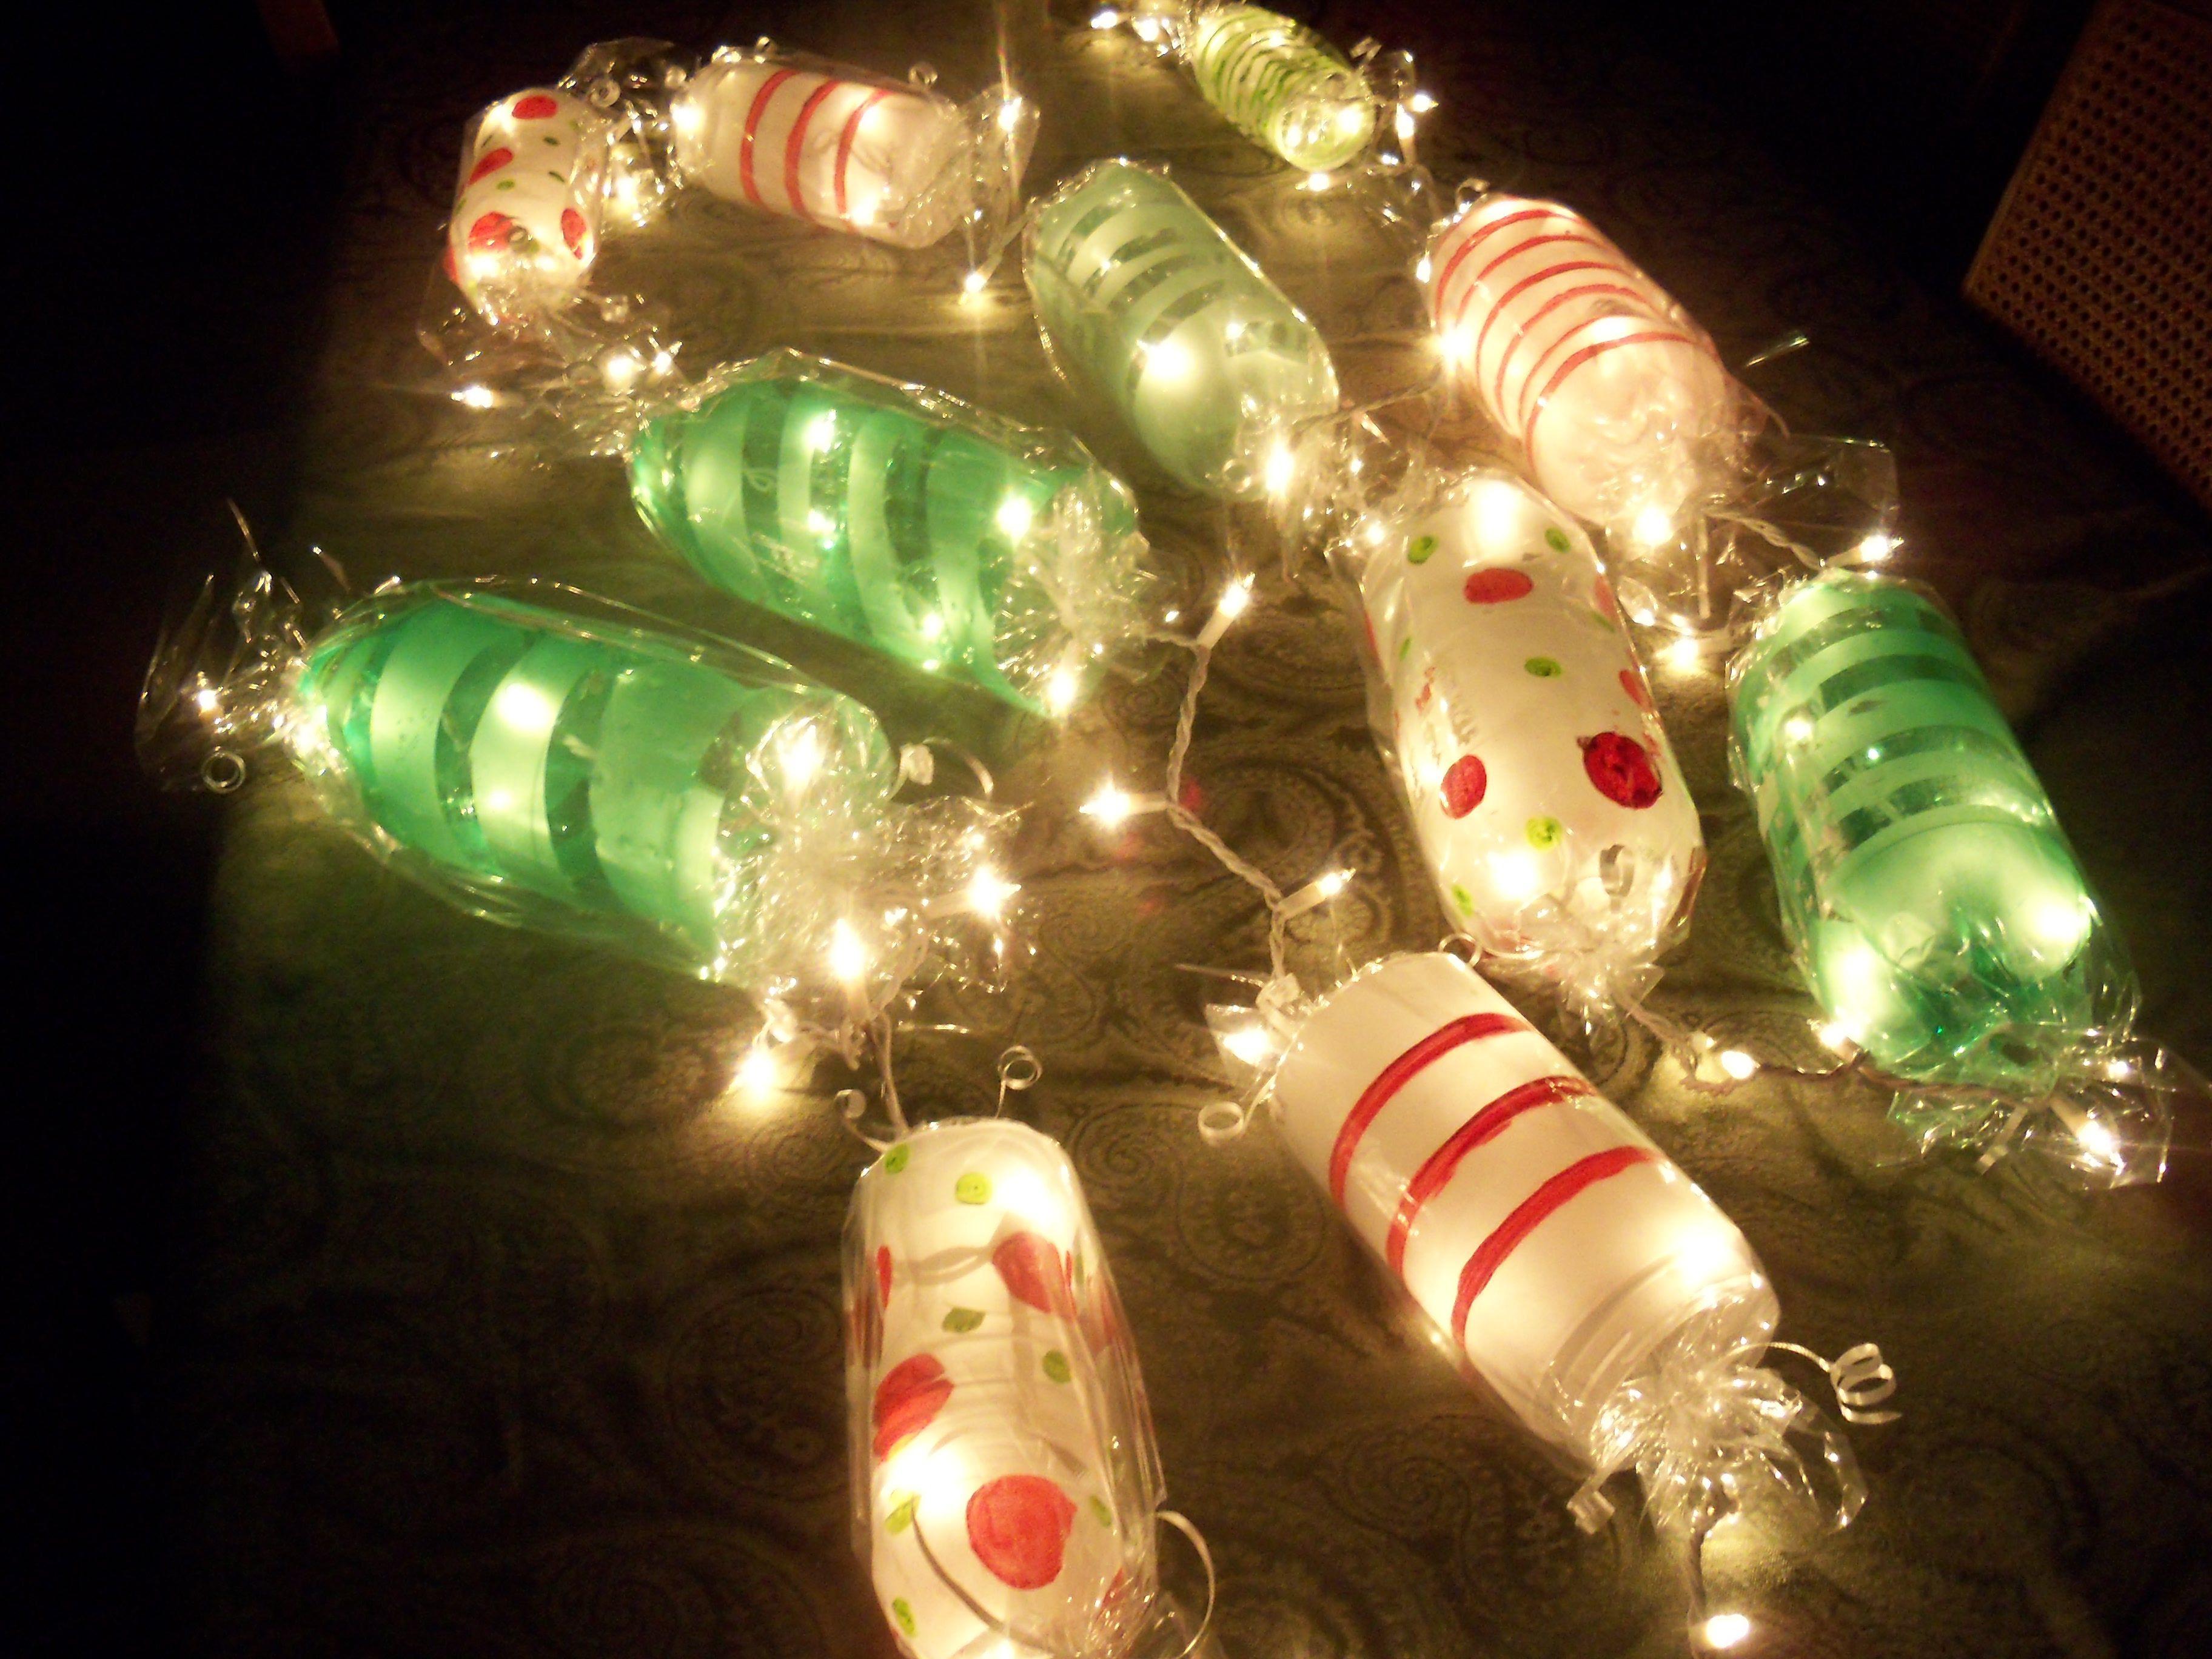 Candy Christmas Lights  Light up Candy Garland Cut ends off soda bottles paint